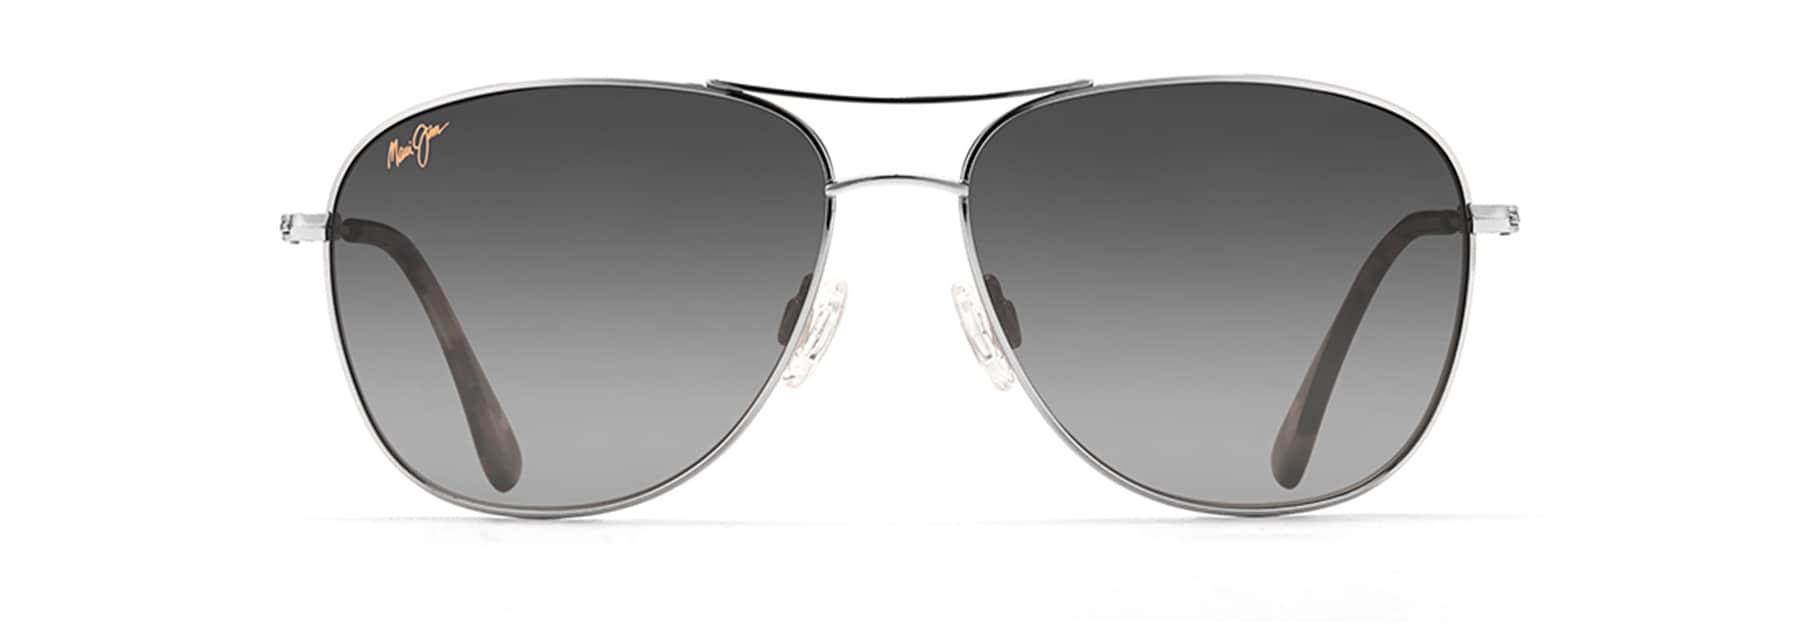 c950ff6ae36 Cliff House Polarized Sunglasses